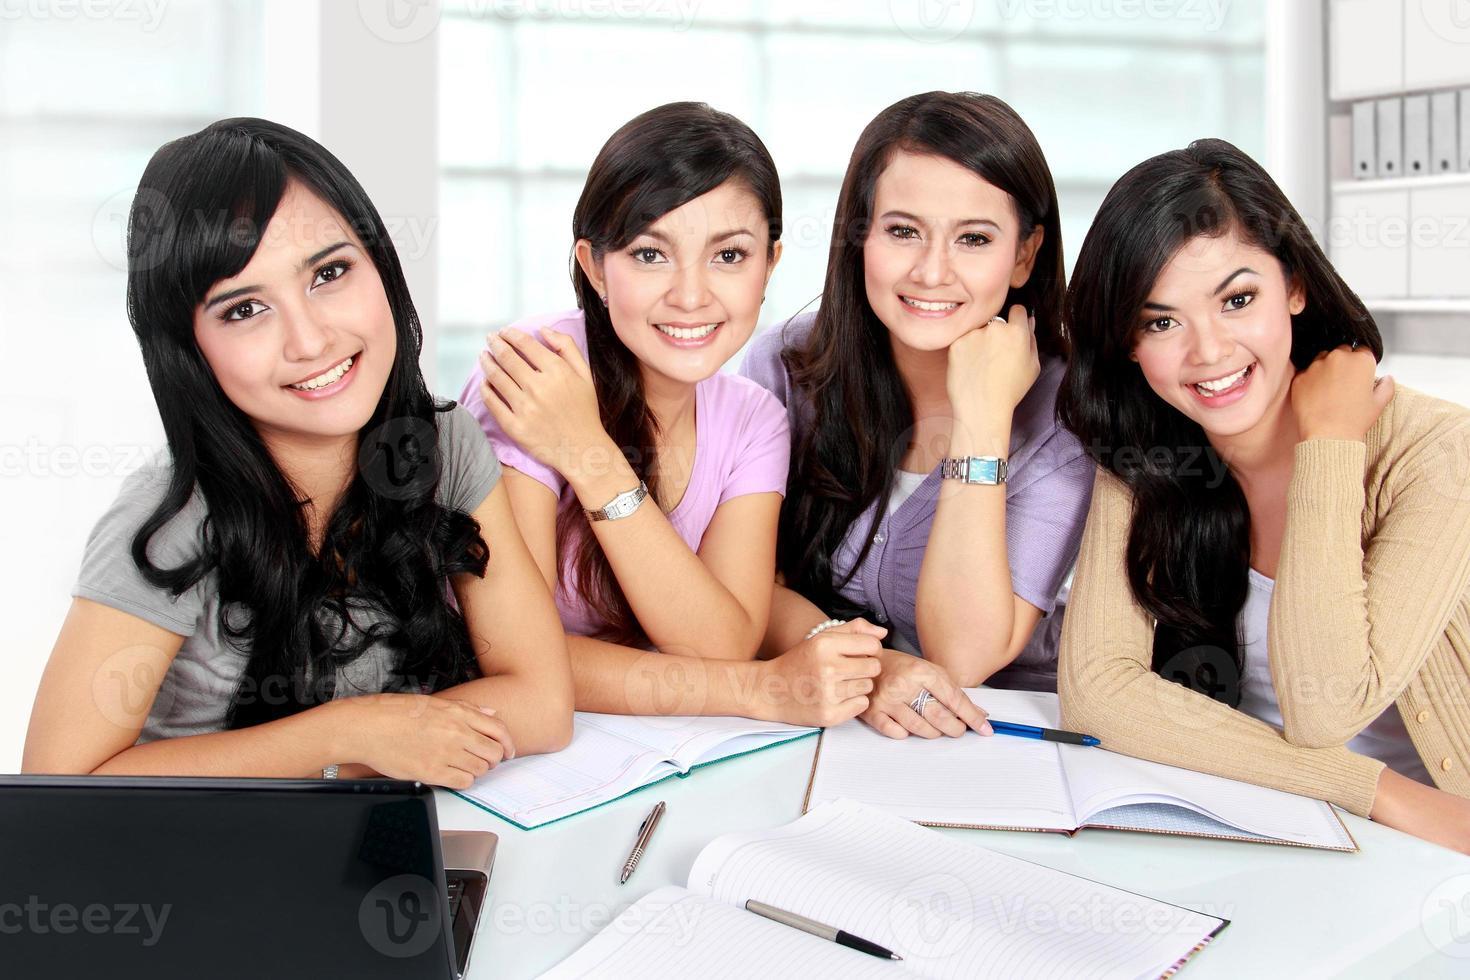 groep student samen studeren foto